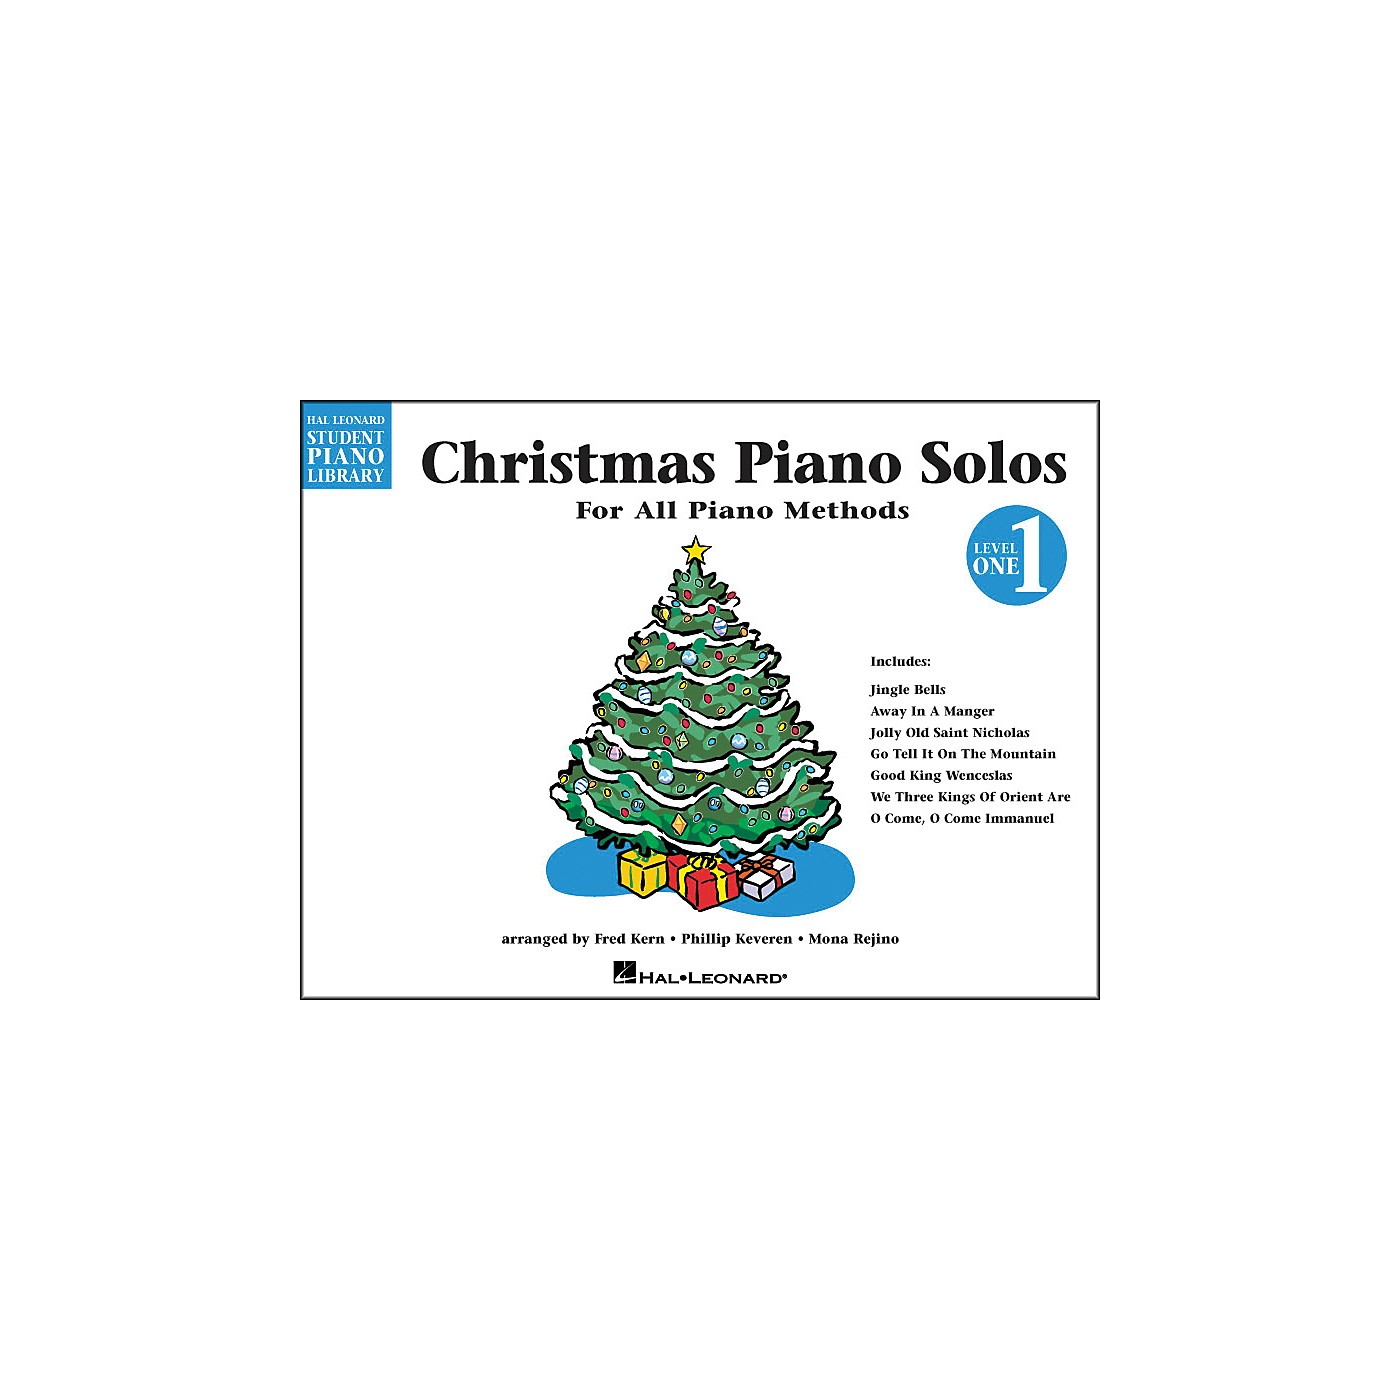 Hal Leonard Christmas Piano Solos Book 1 Hal Leonard Student Piano Library thumbnail